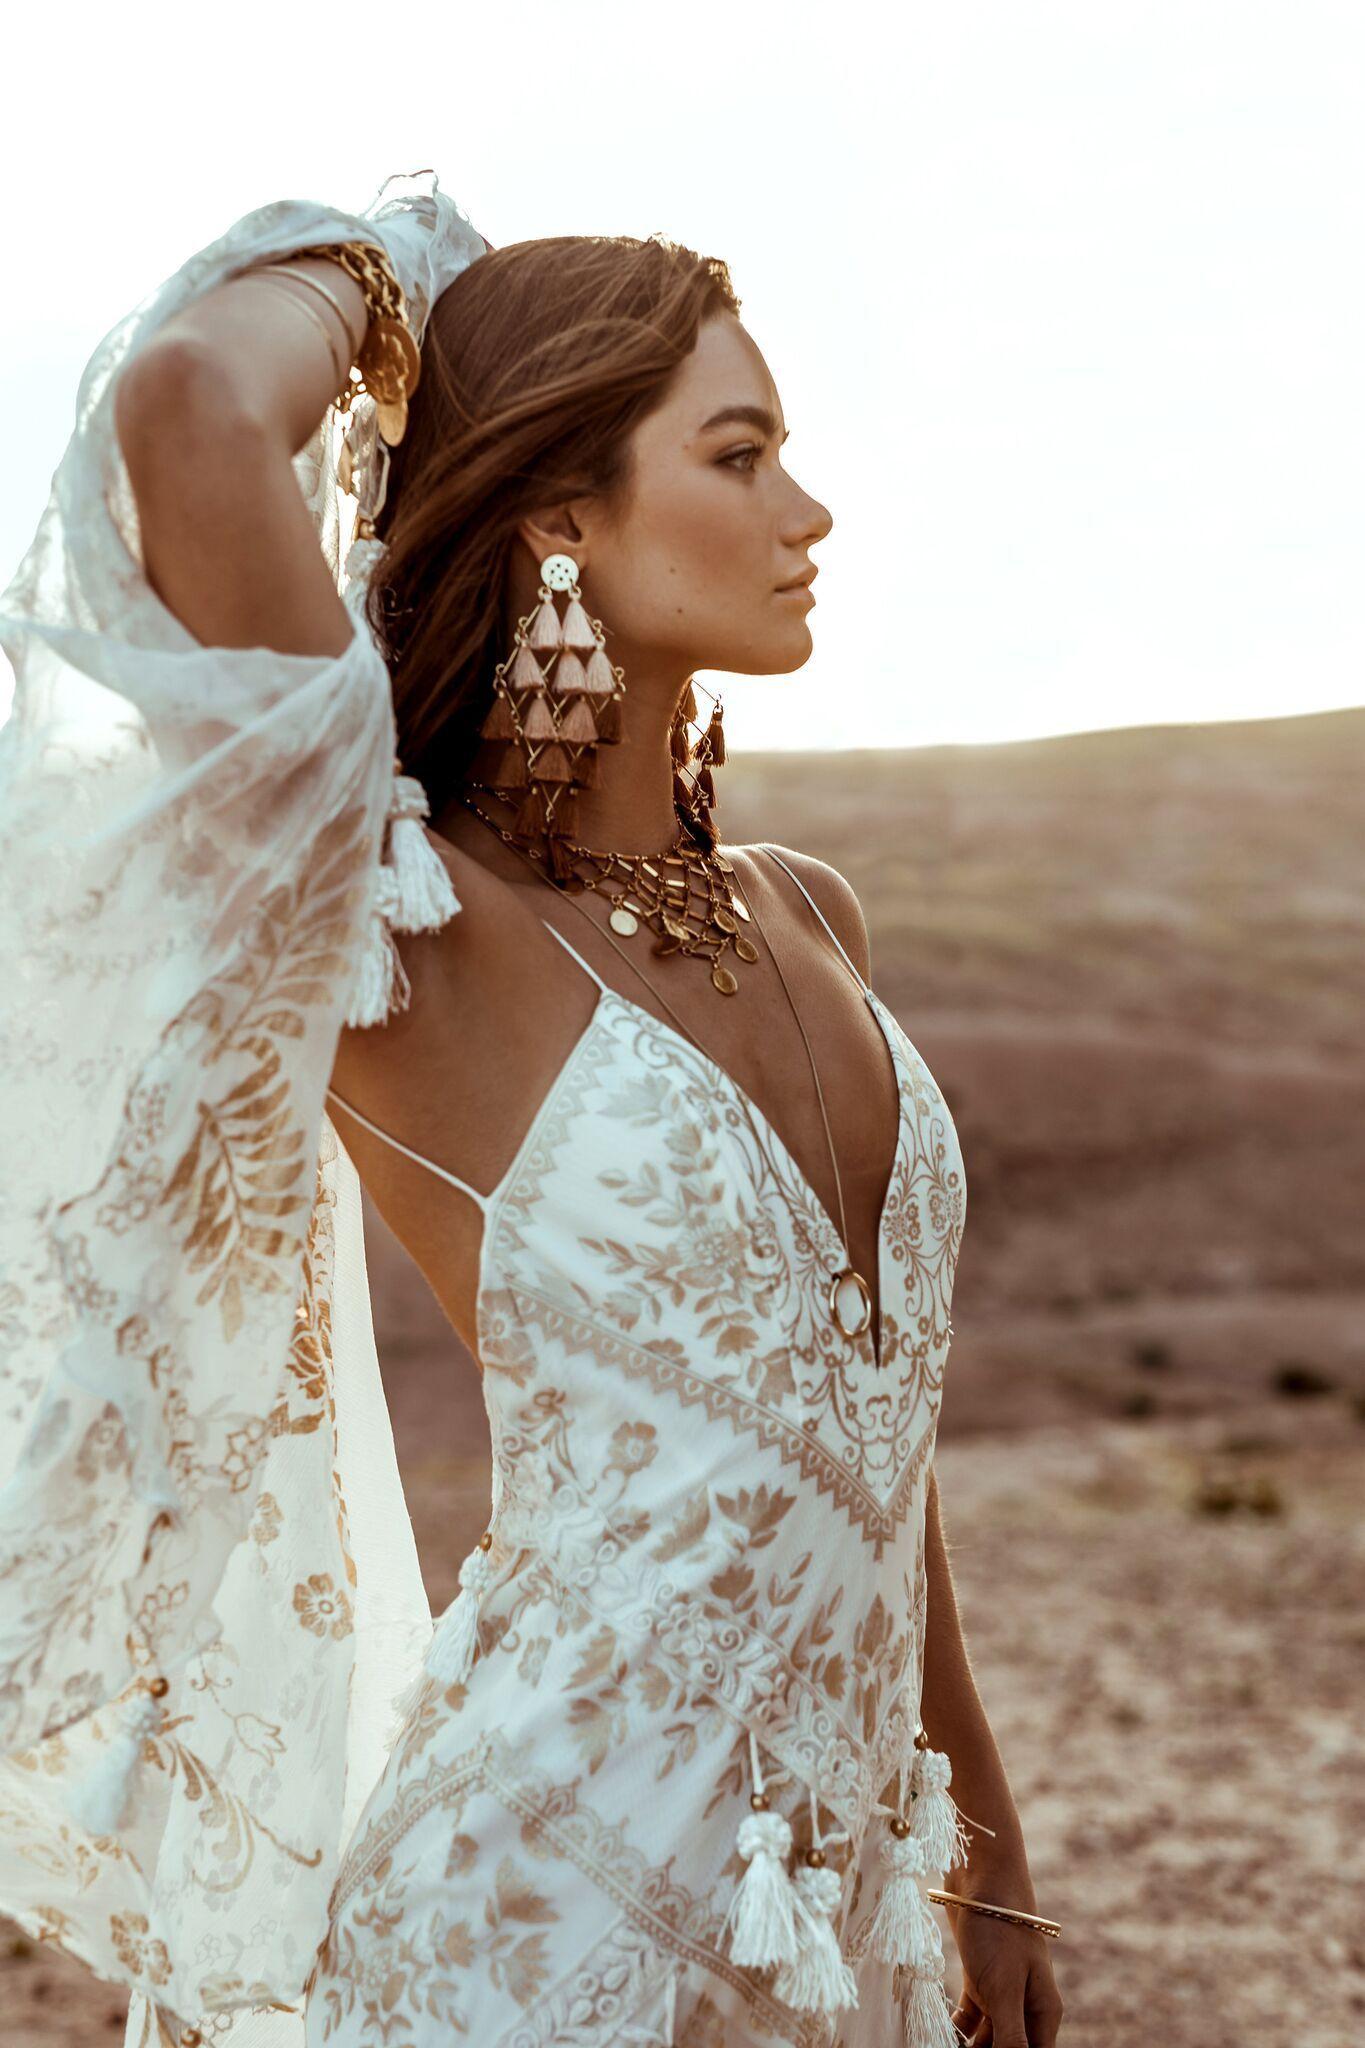 New rue de seine wedding dresses trunk shows beach wedding dress